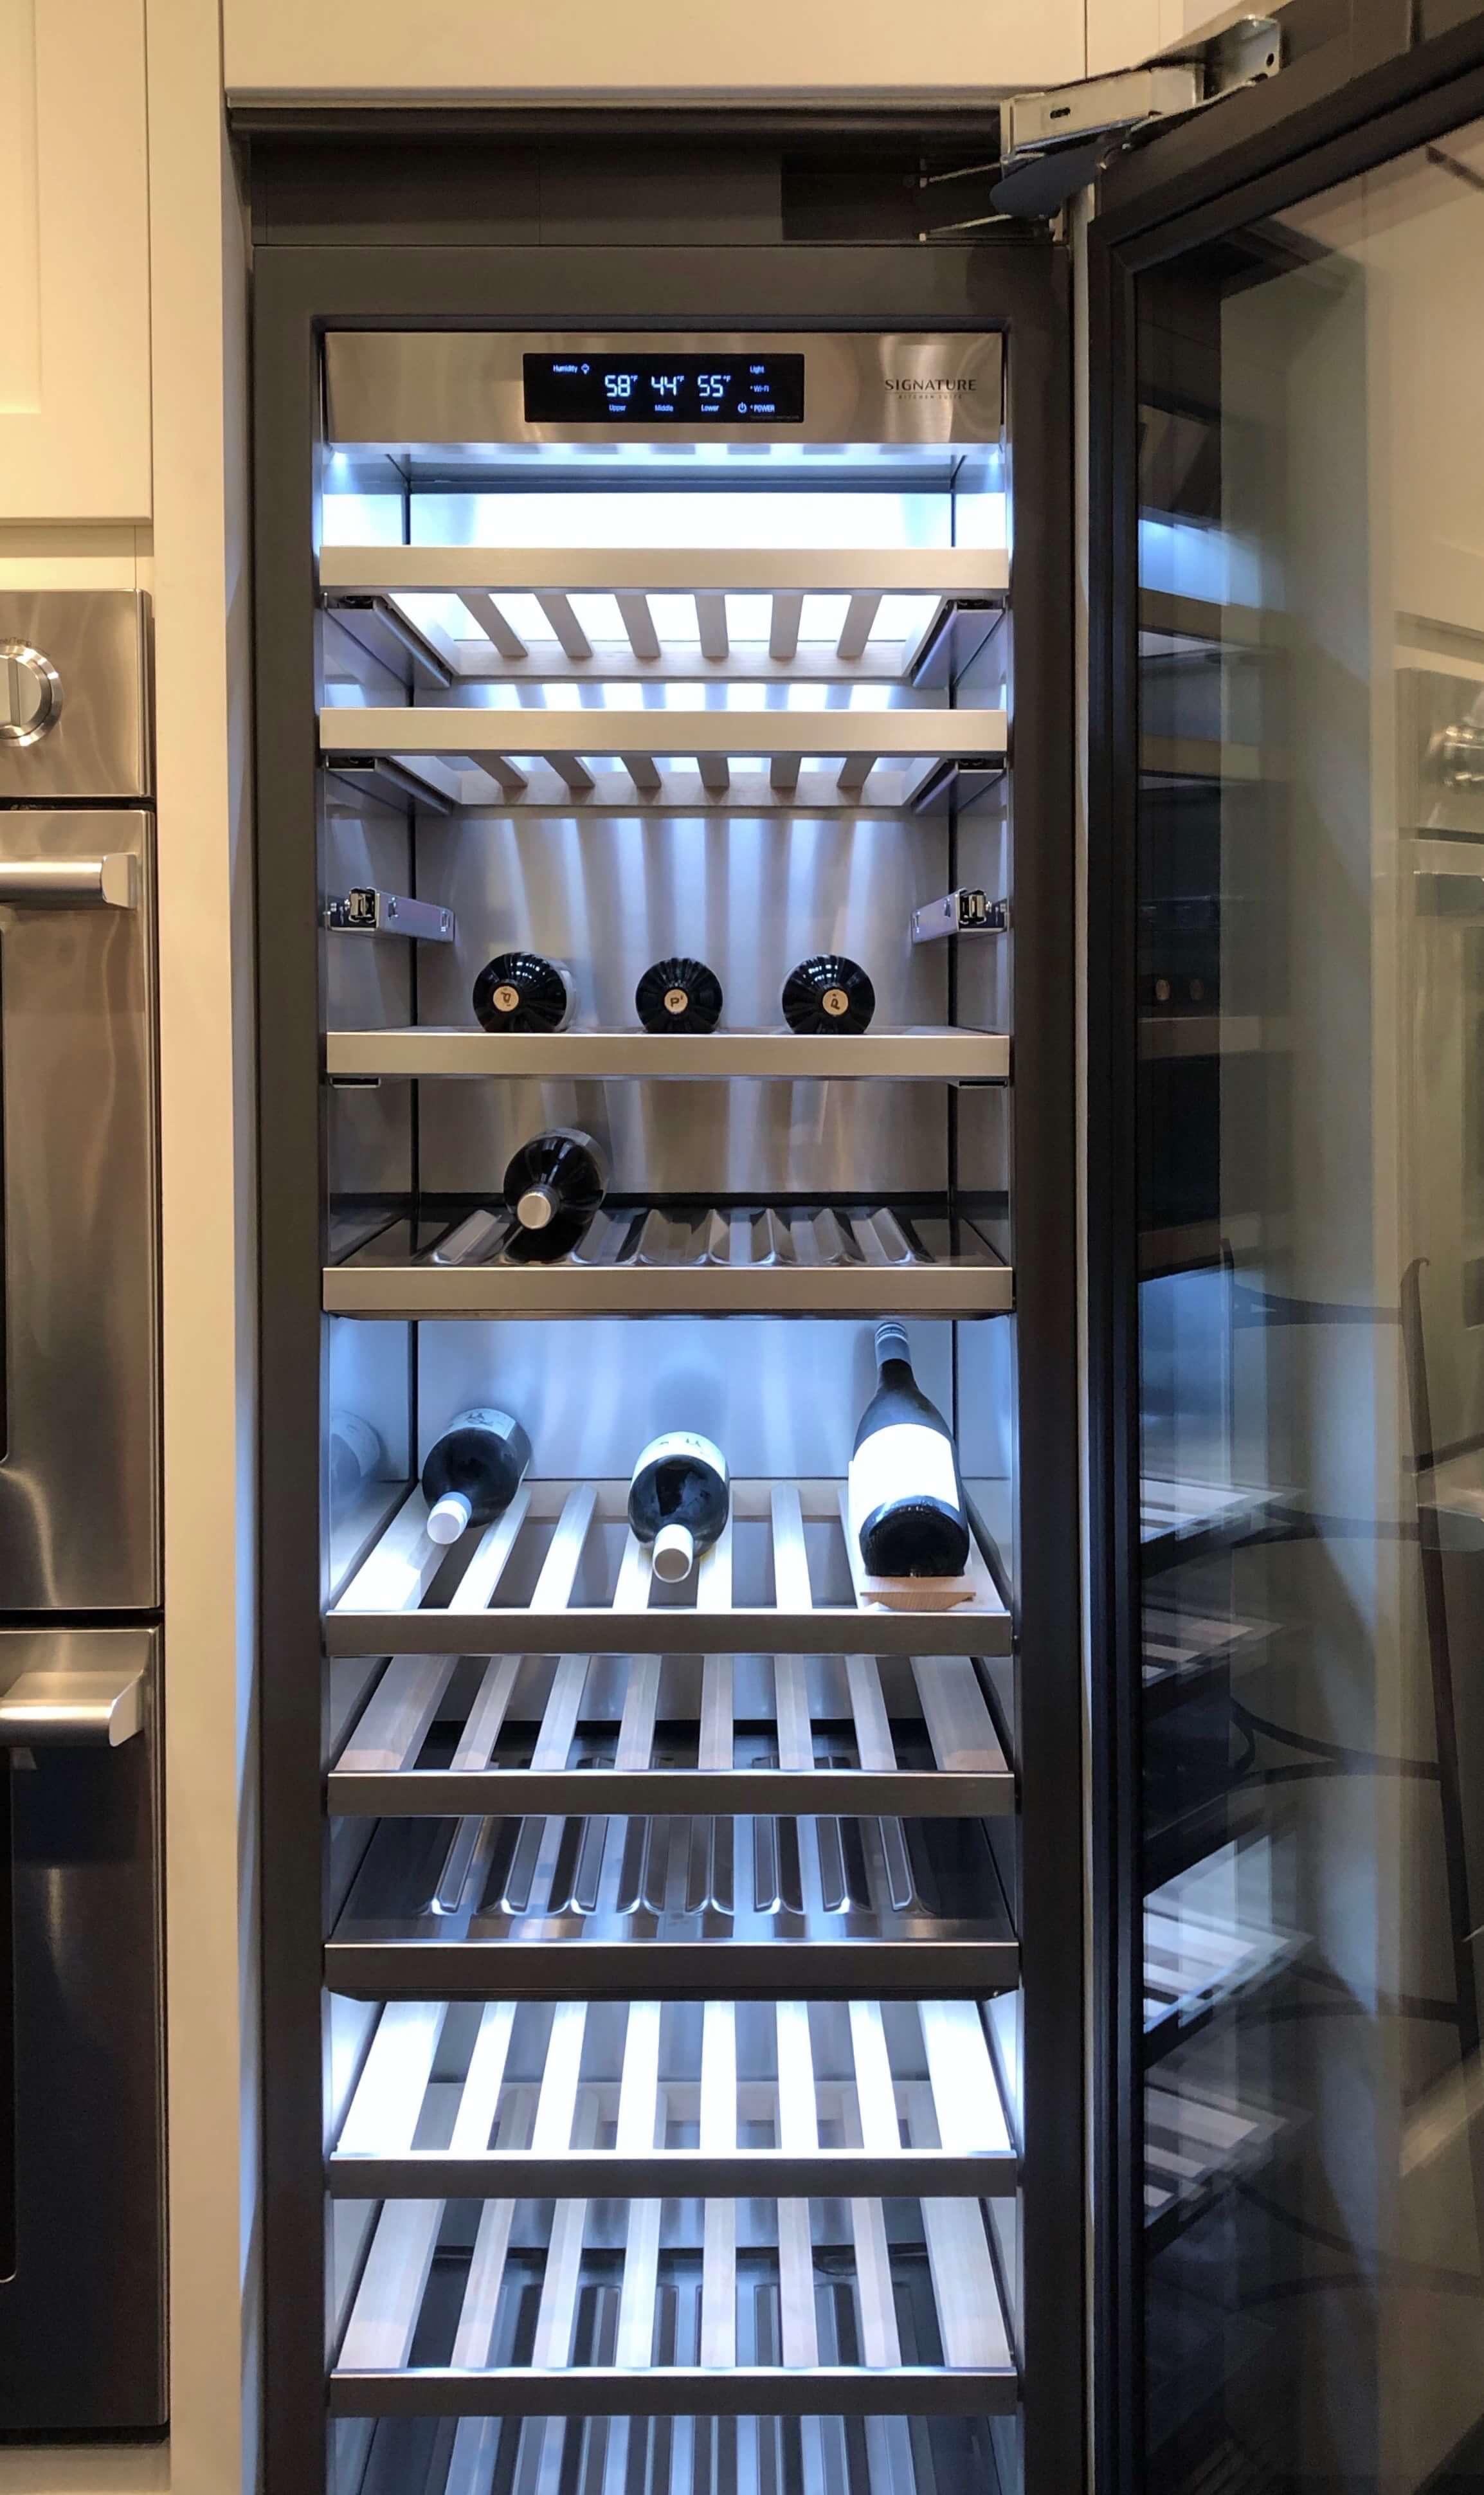 Interior of wine refrigeration unit | SKS Appliances Experience and Design Center, Napa